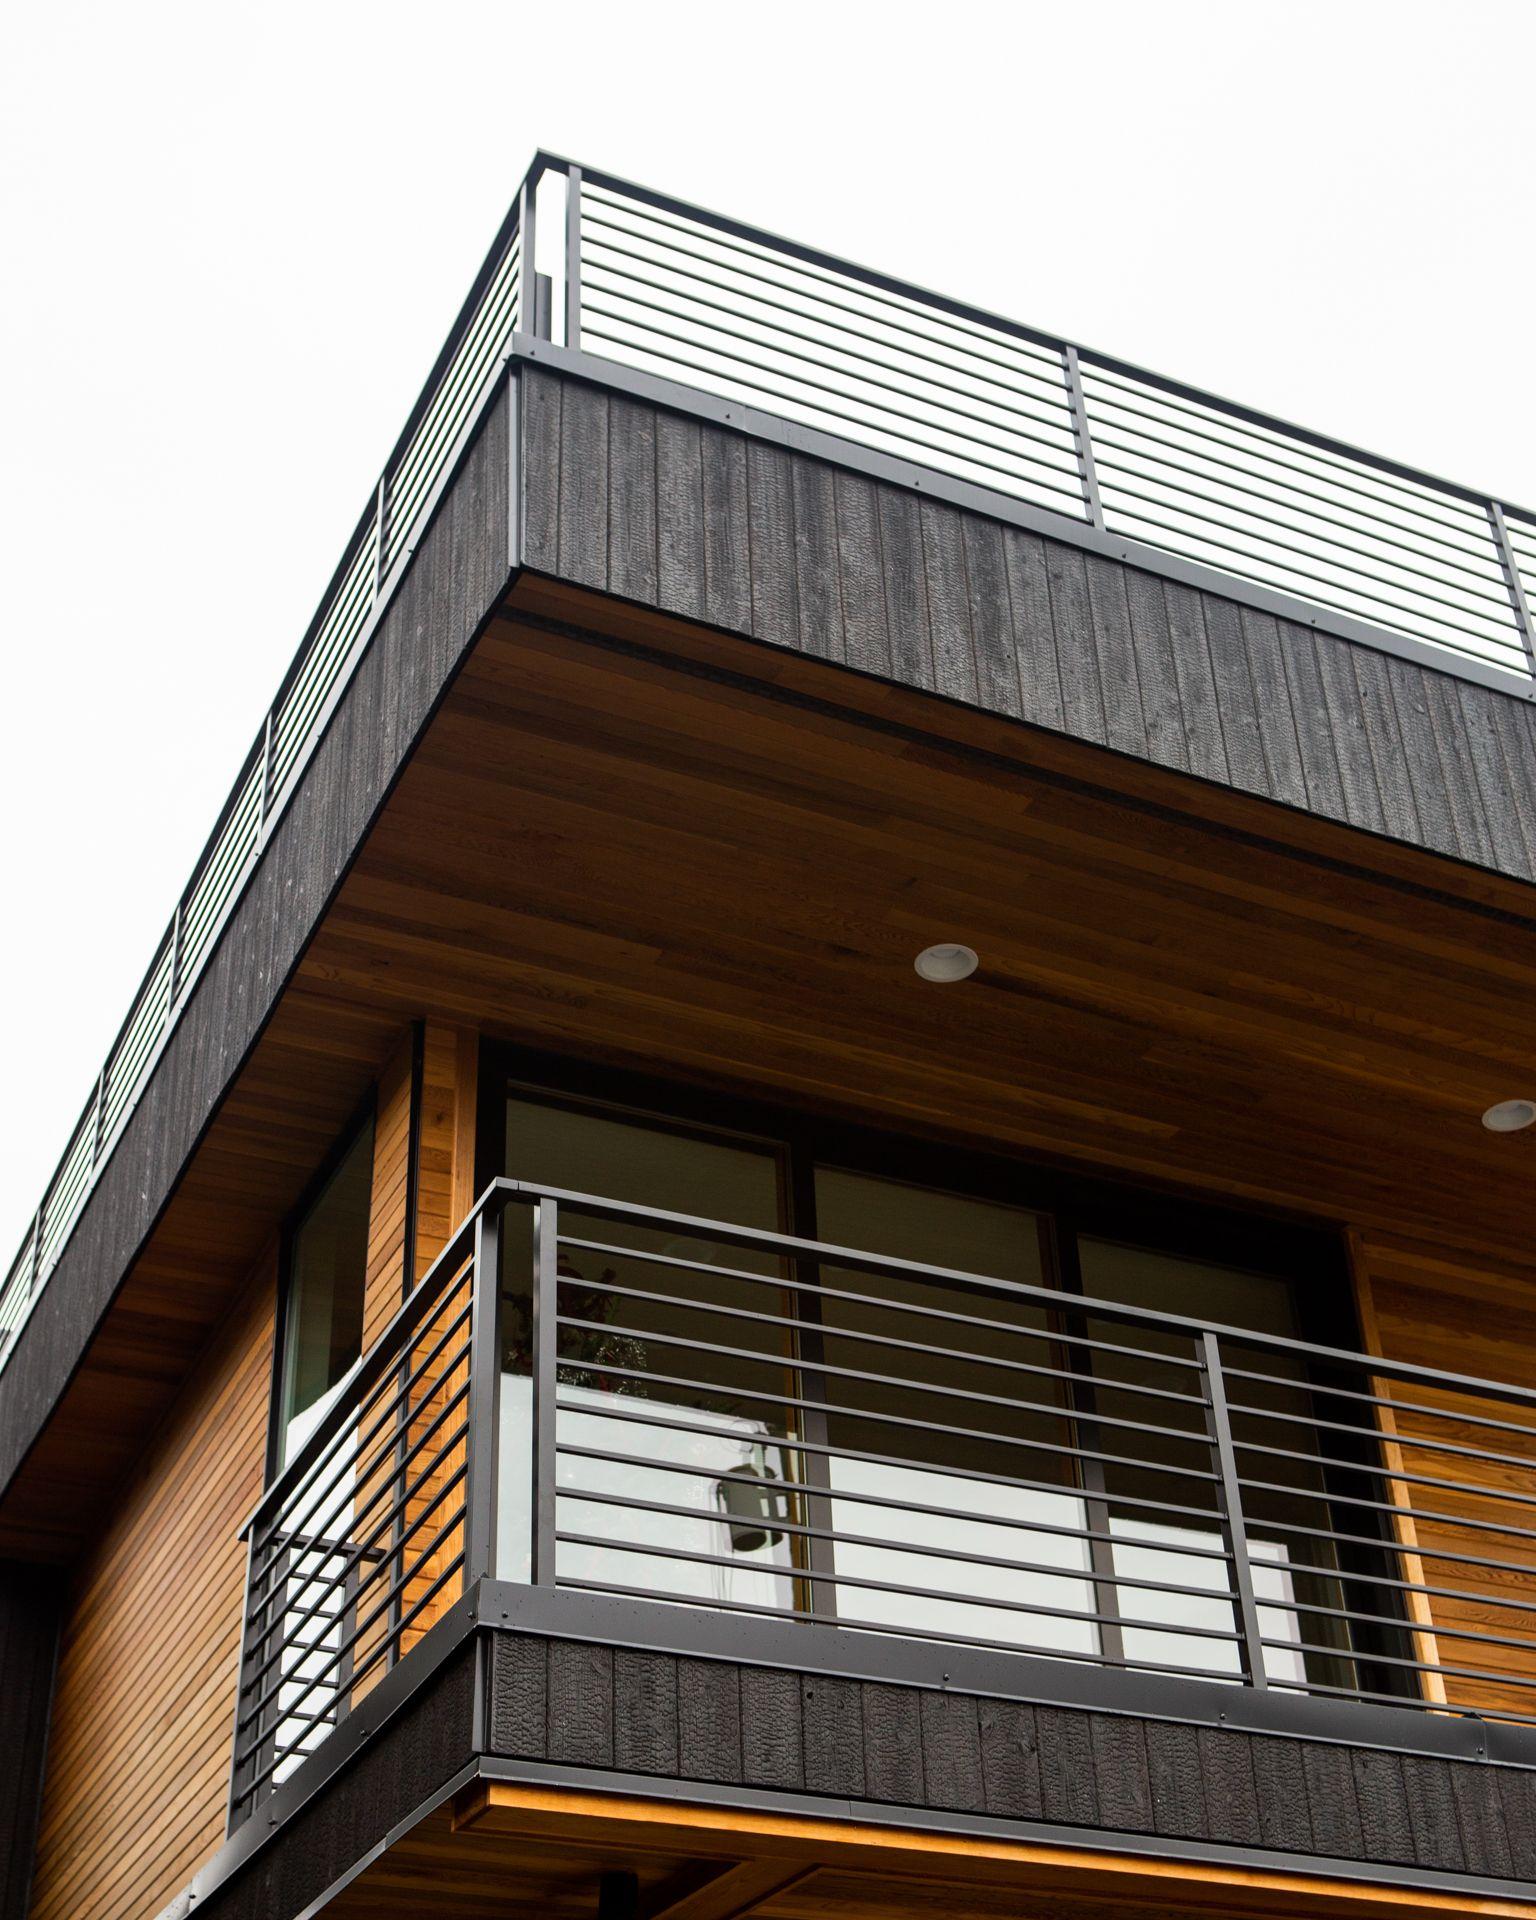 Midvale House Nakamoto Forestry Yakisugi Shou Sugi Ban Exterior Wall Cladding Wall Cladding Cladding